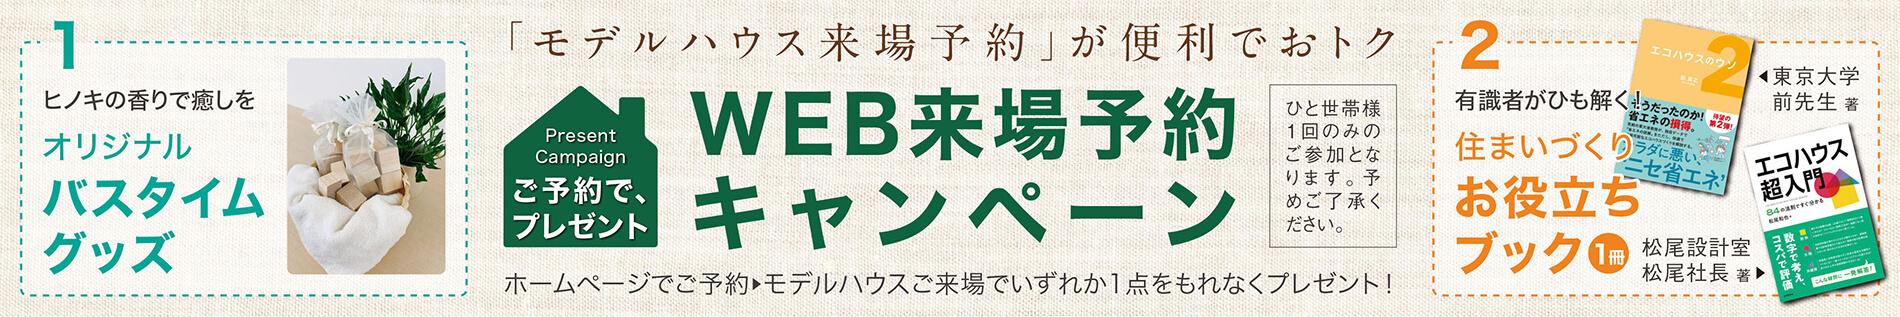 WEB来場予約キャンペーン